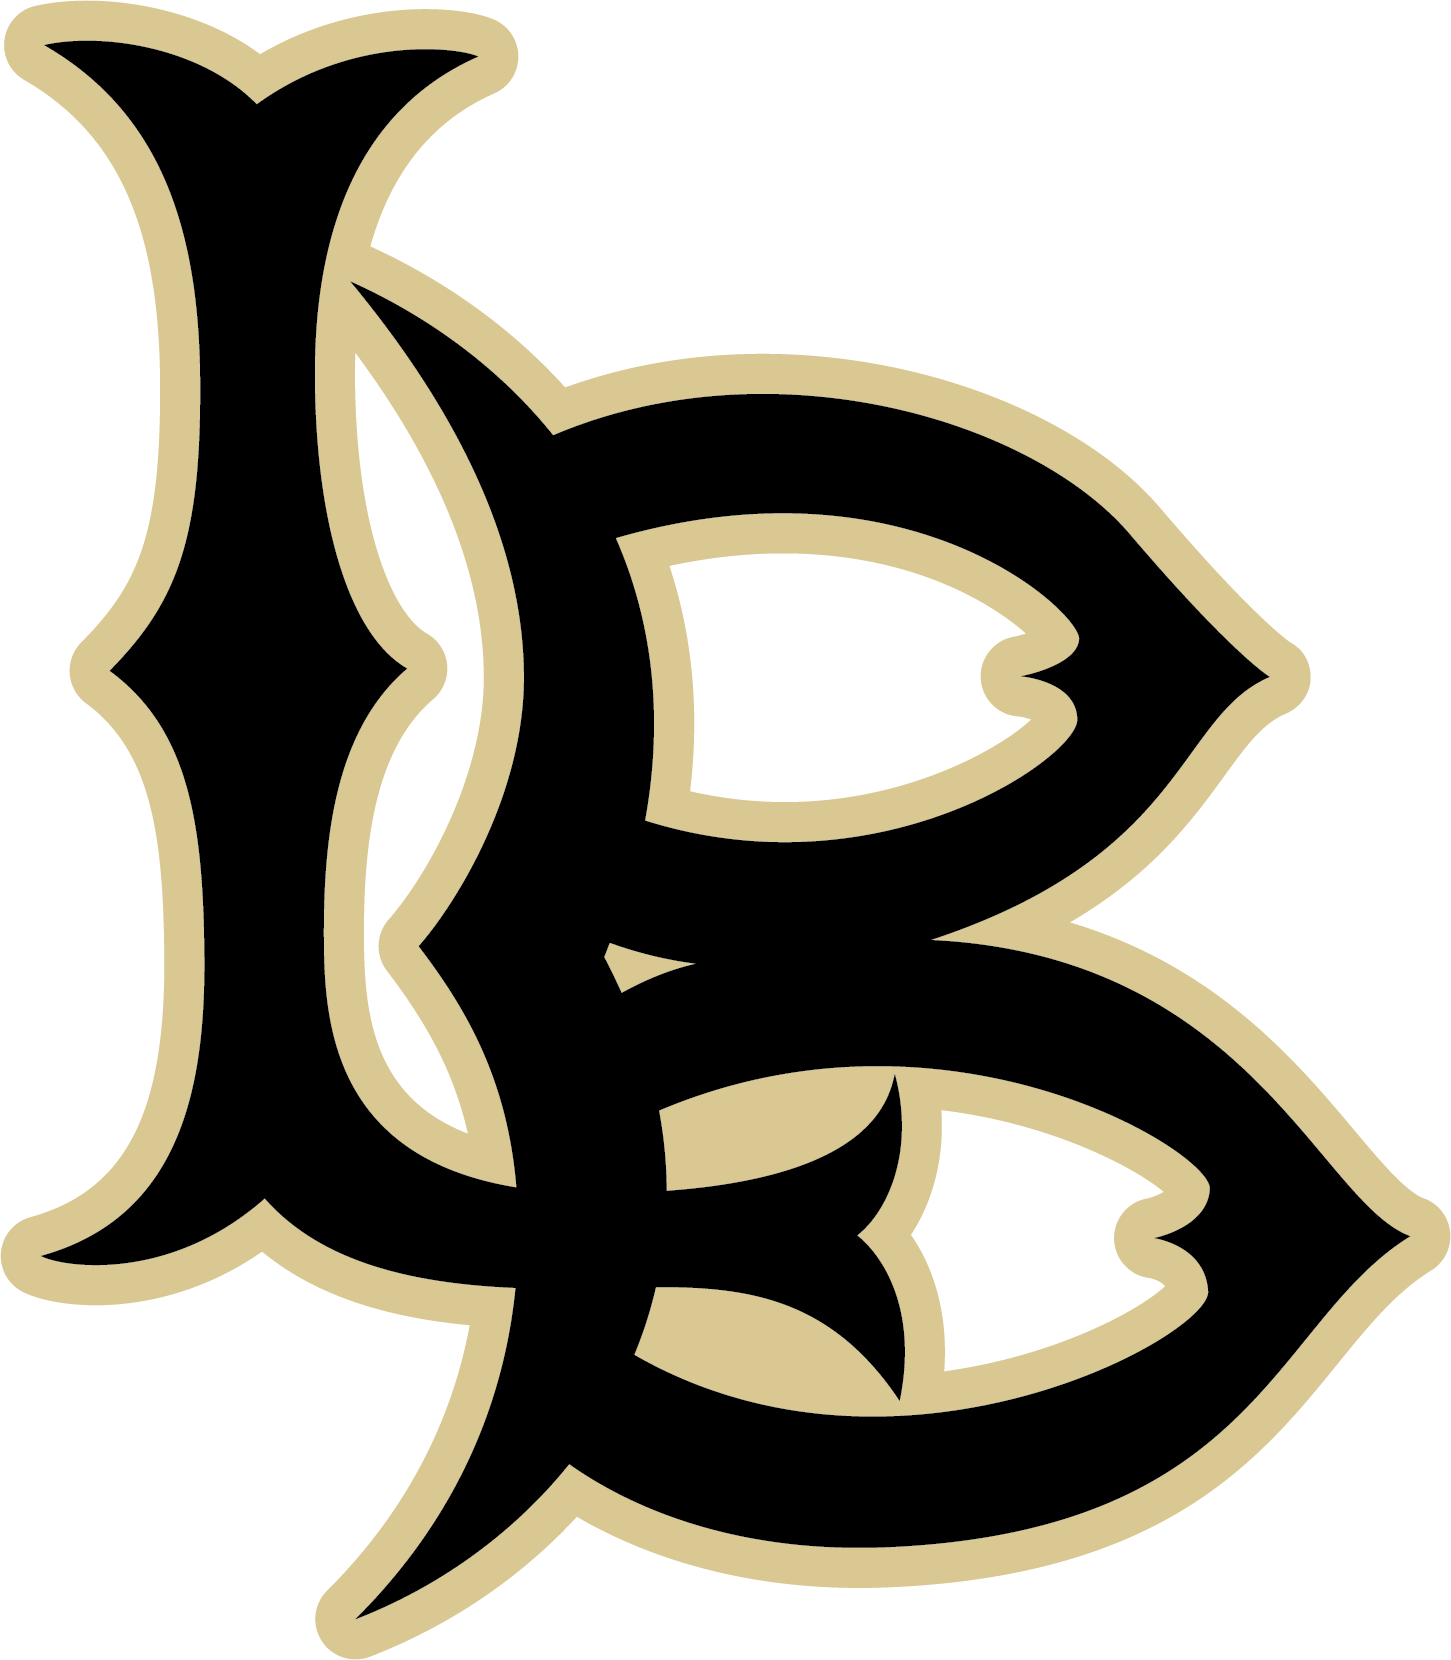 Image result for london badgers logo